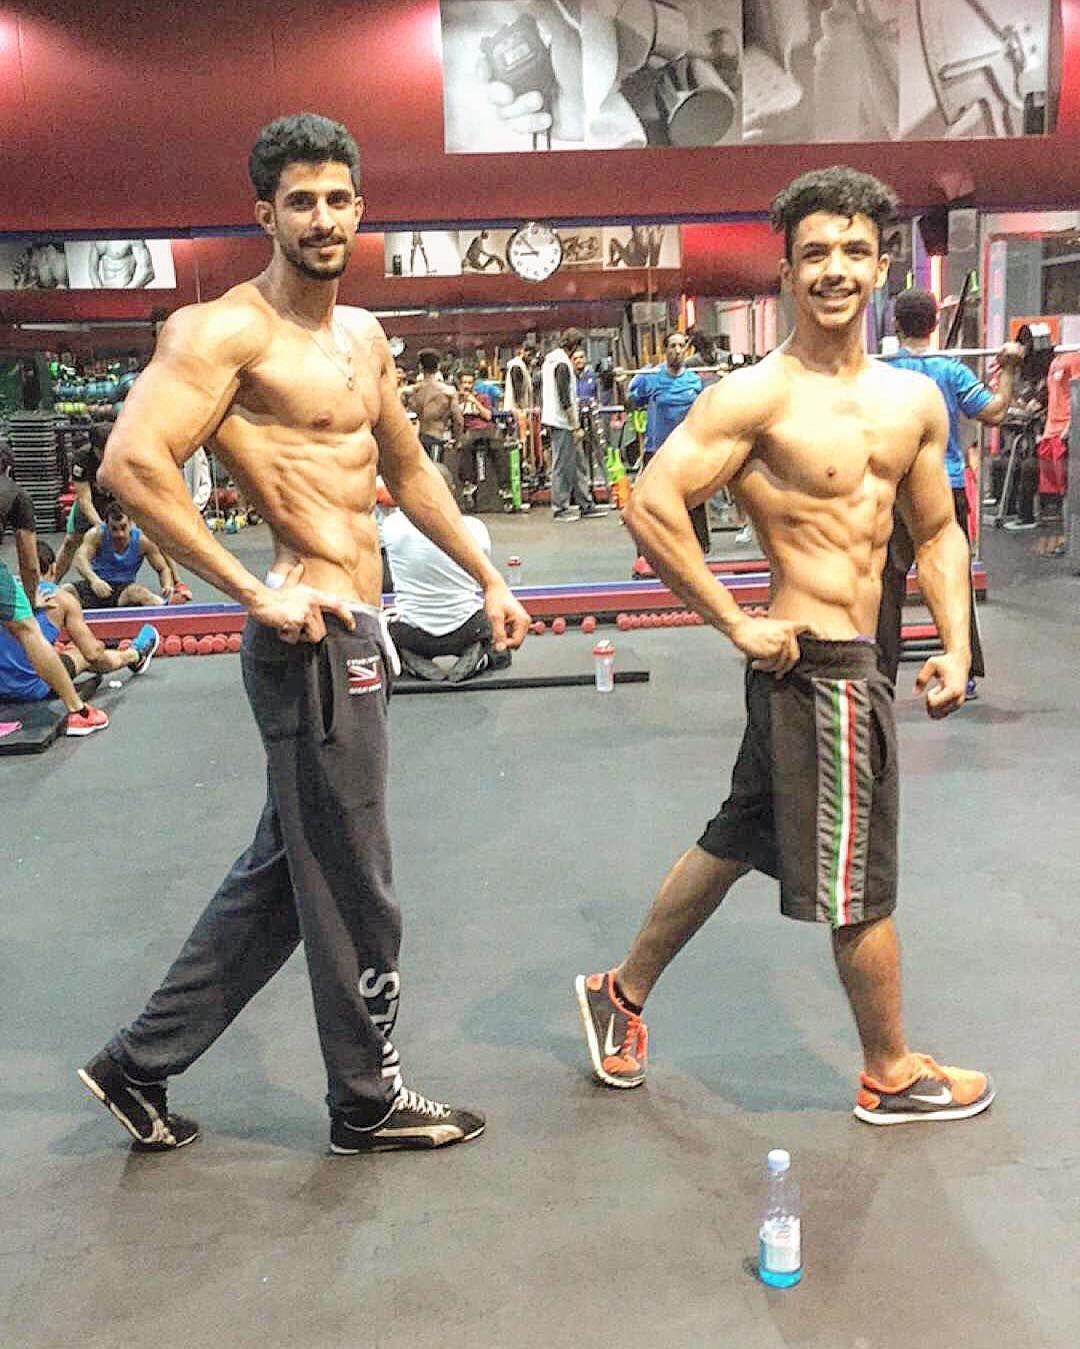 #كمال_اجسام #muscles#bodybuilder #الكويت#summer #workout#fitness #athletes#bicep #squat#deadlift #ah...